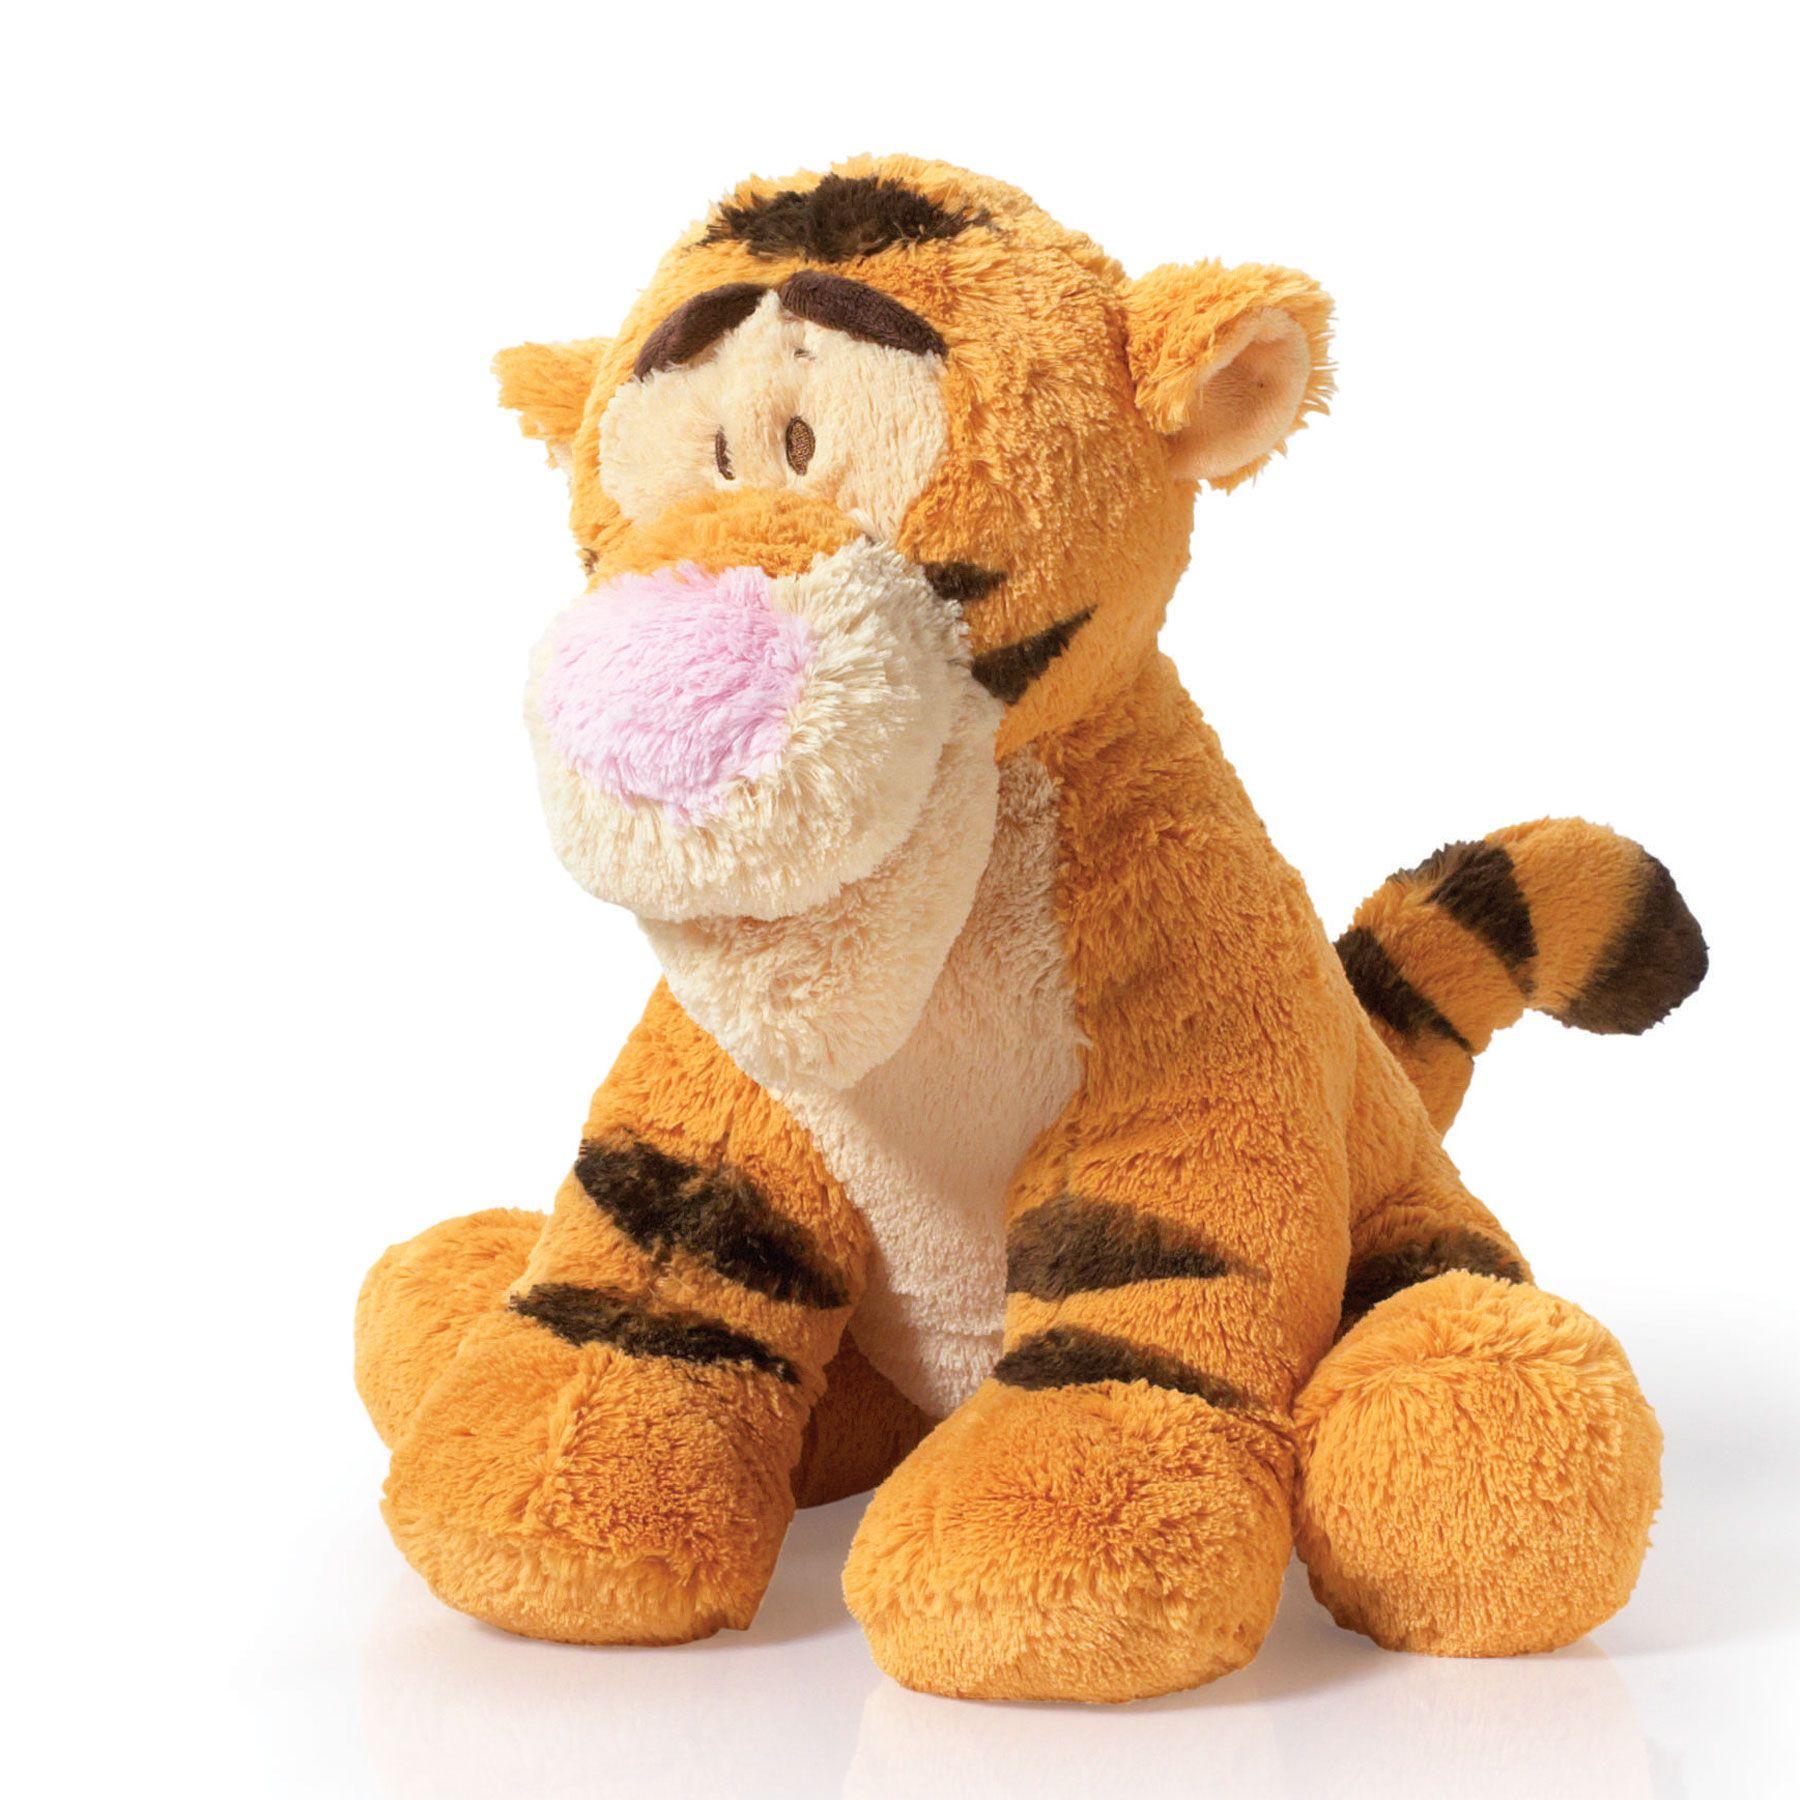 Winnie The Pooh Toys : Winnie the pooh tigger ″ plush toy εmmα grαcε mαriε